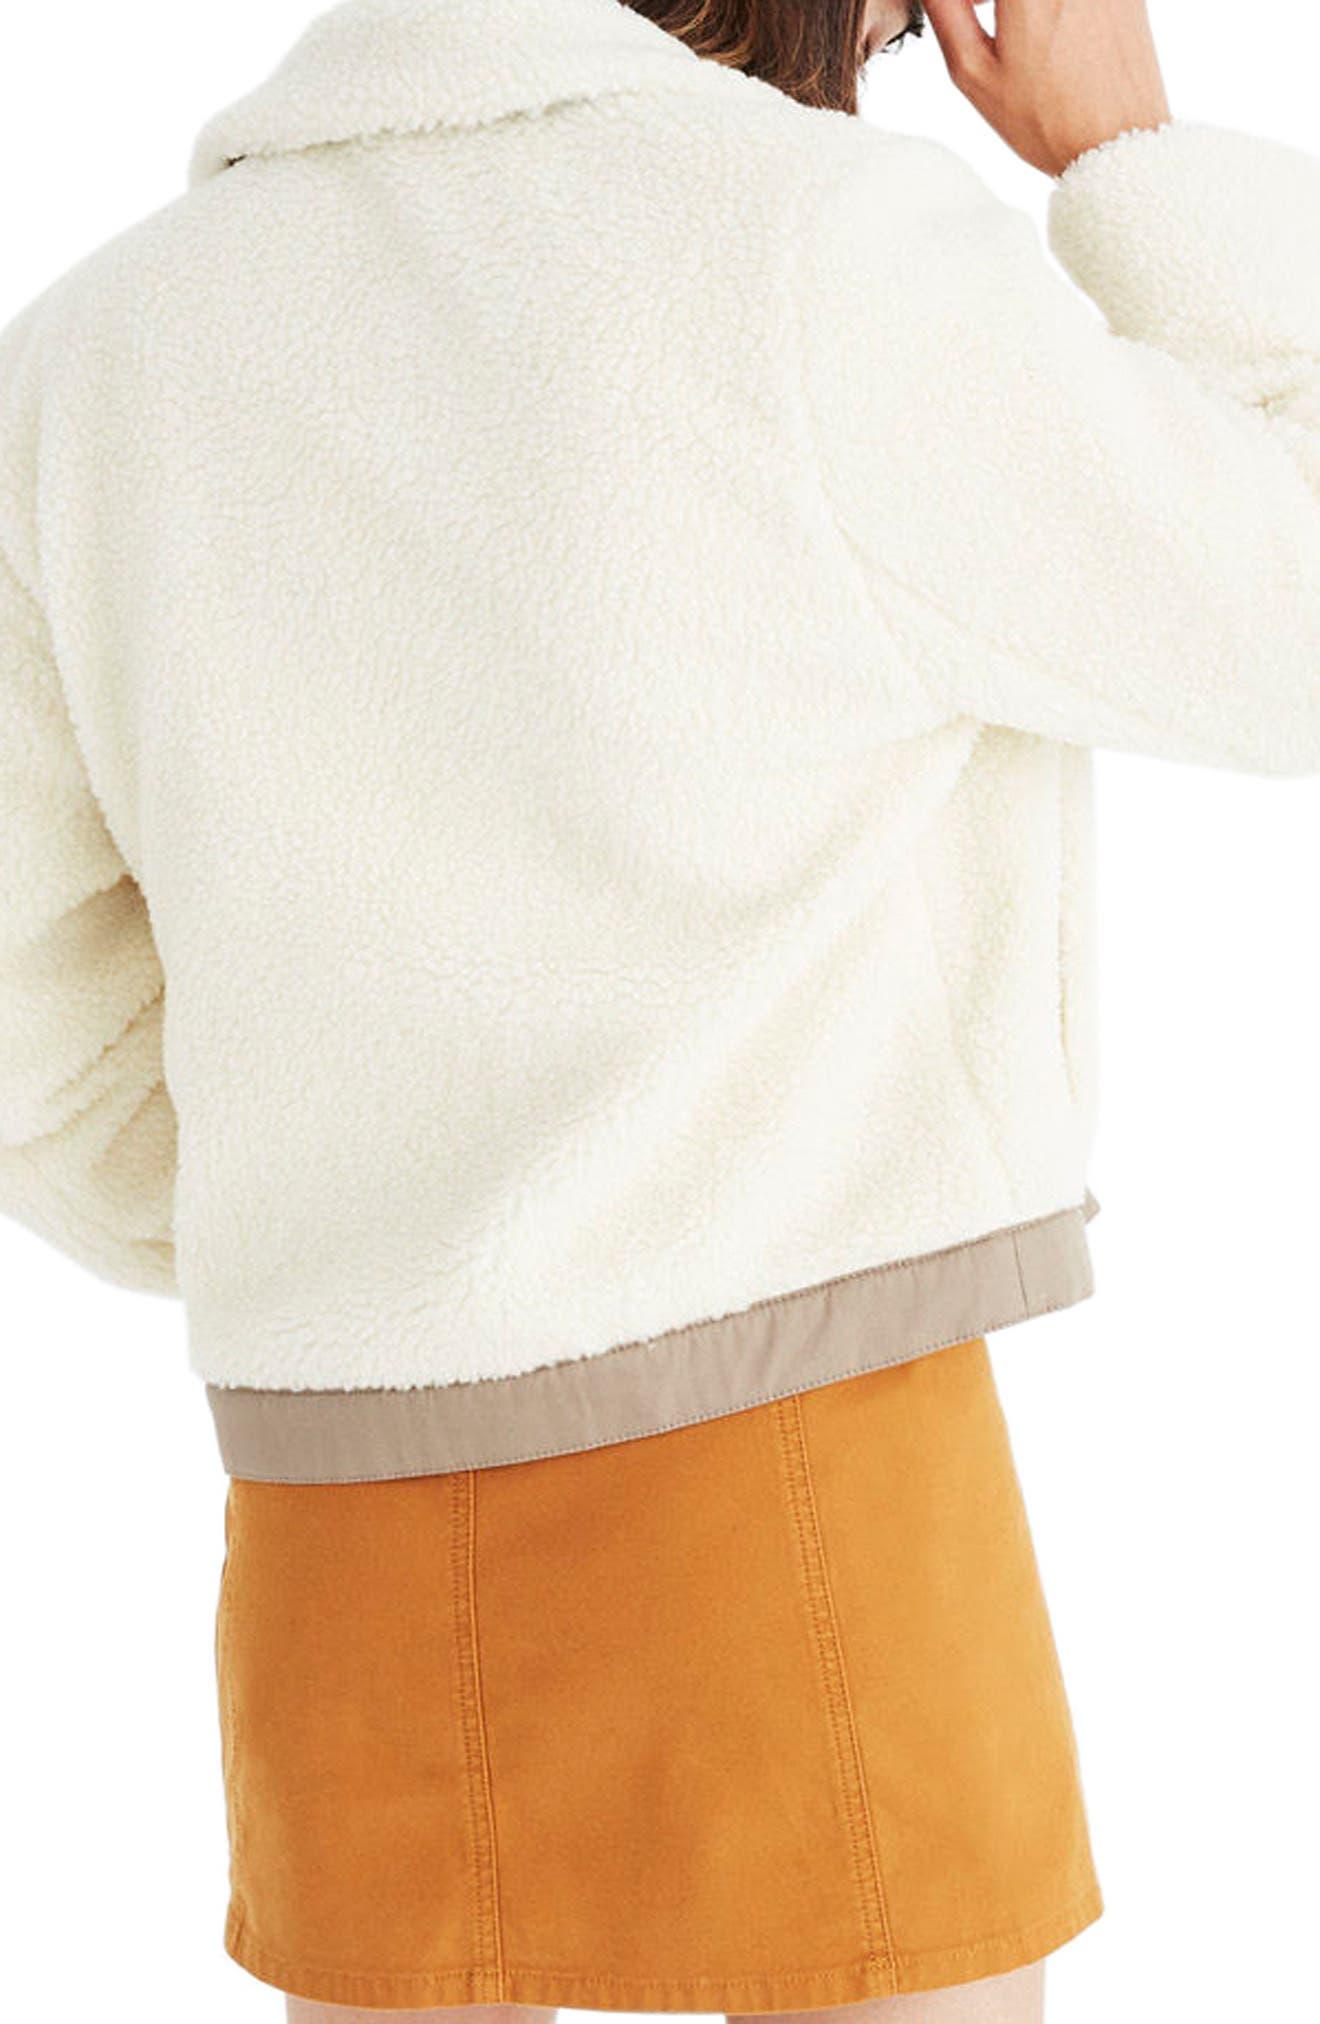 Alternate Image 2  - Madewell Portland Faux Shearling Jacket